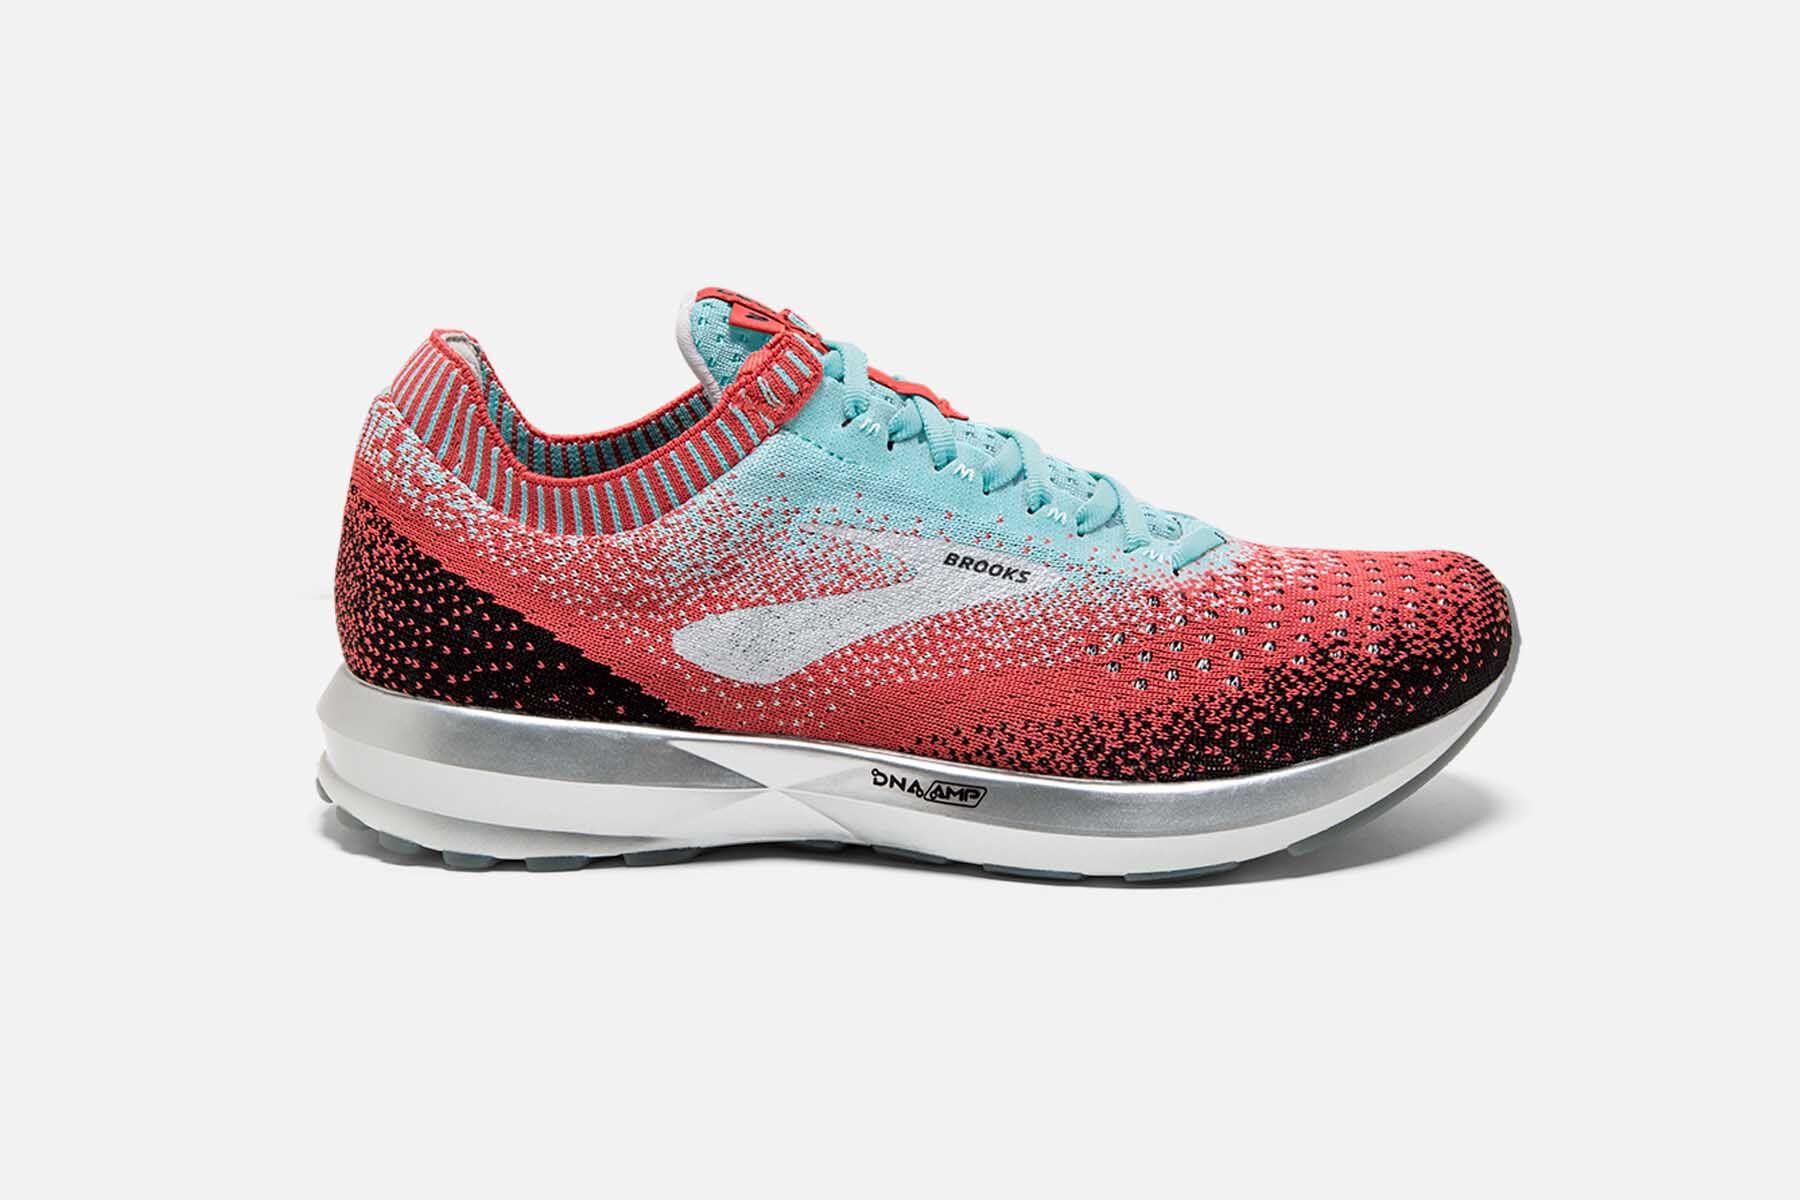 brooks running sneakers